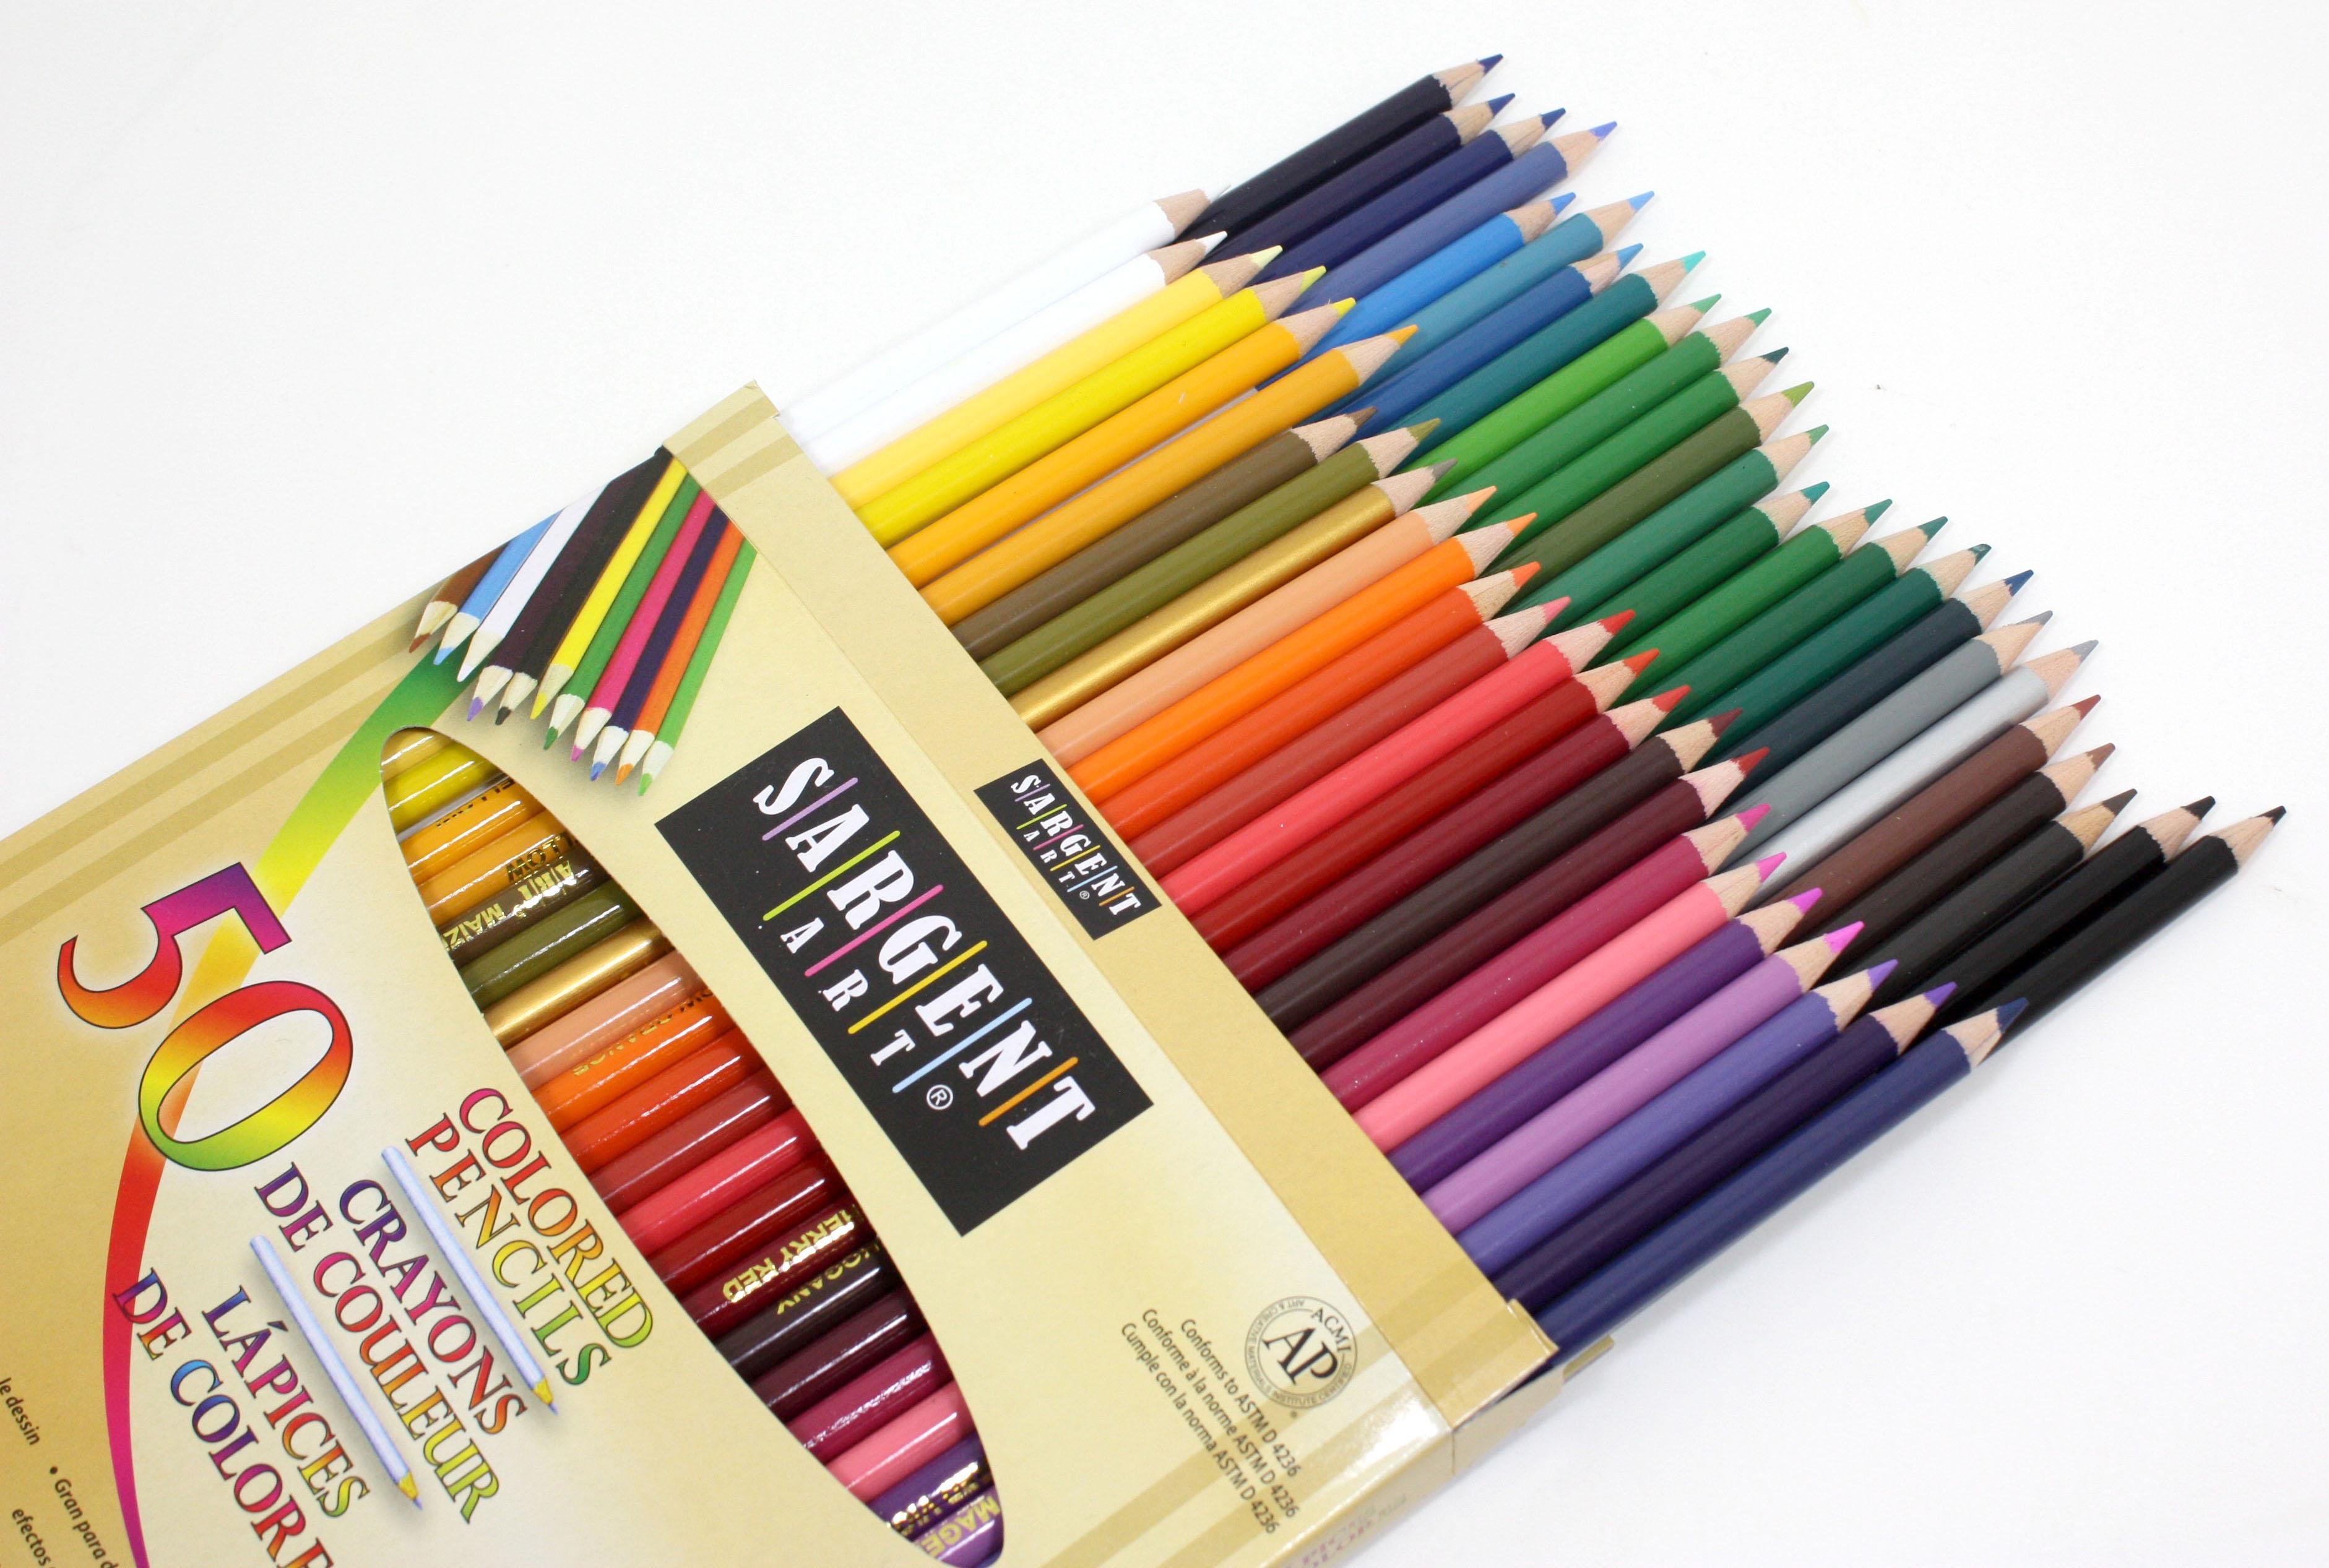 Prismacolor Crafts Store